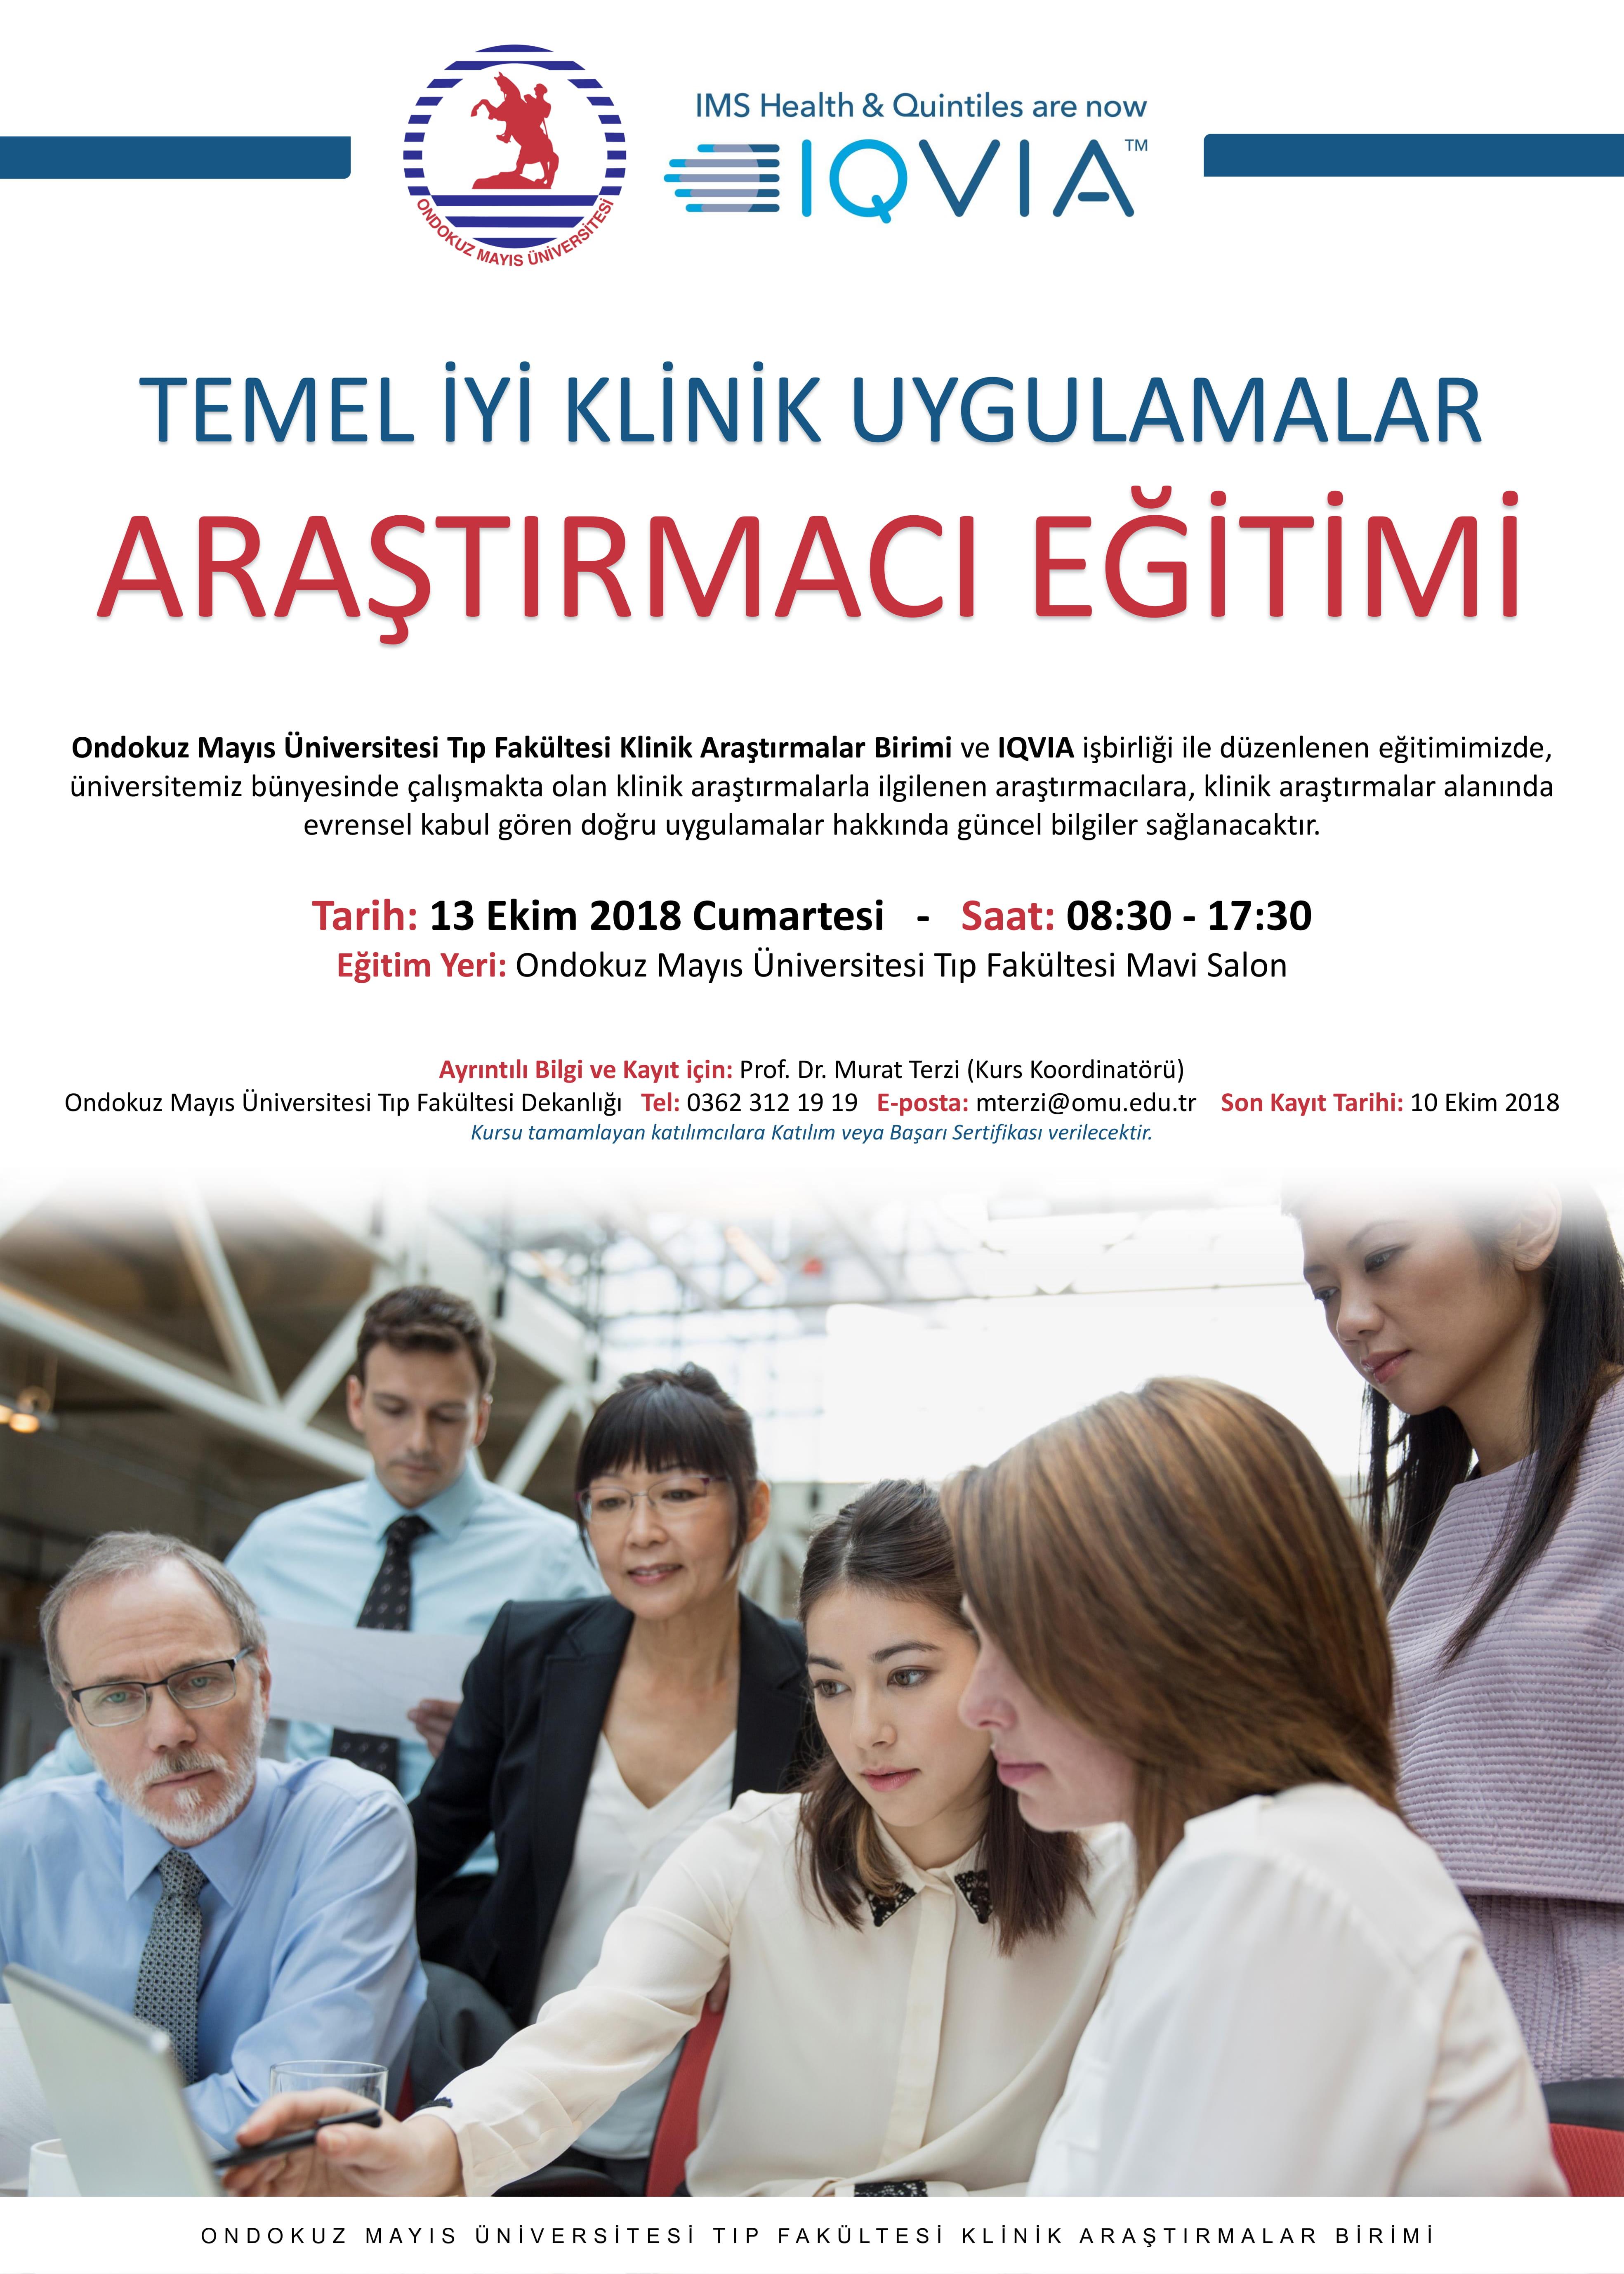 http://www.omu.edu.tr/sites/default/files/files/temel_iyi_klinik_uygulamalar_arastirmaci_egitimi_/klinik-1.jpg